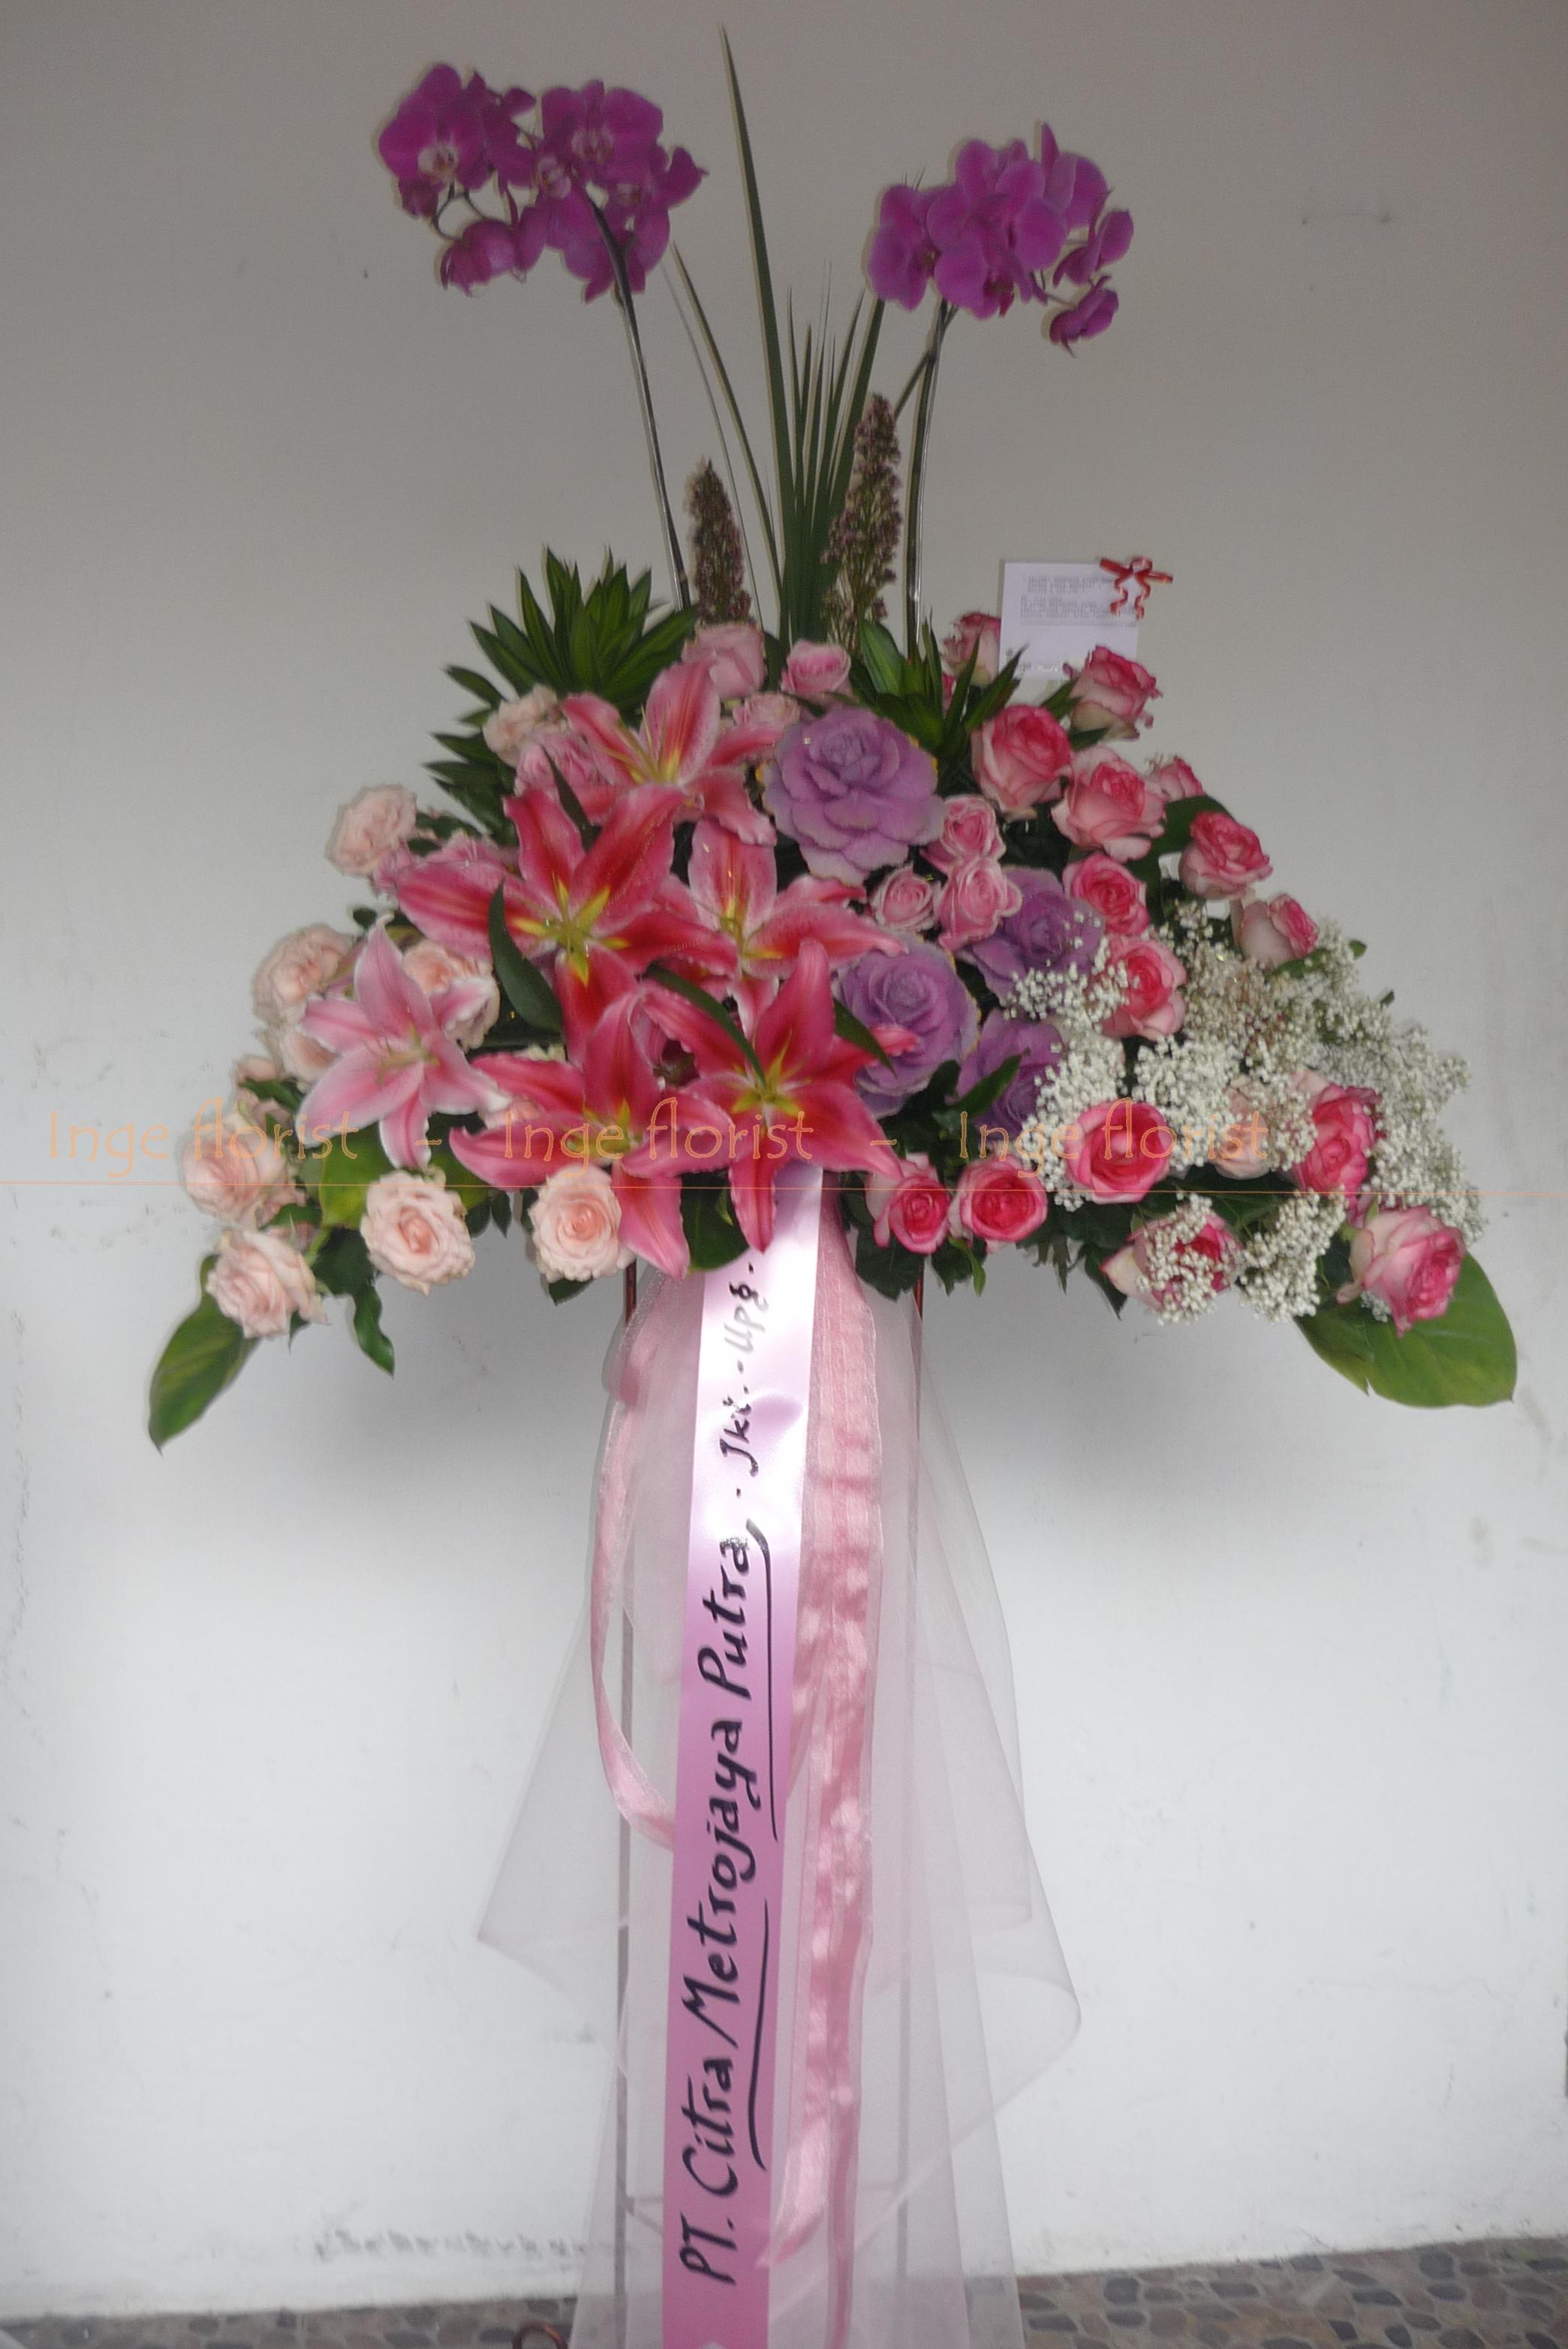 P1060468 inge florist wedding decoration dekorasi pernikahan standing flower congratulation p1060468 junglespirit Choice Image